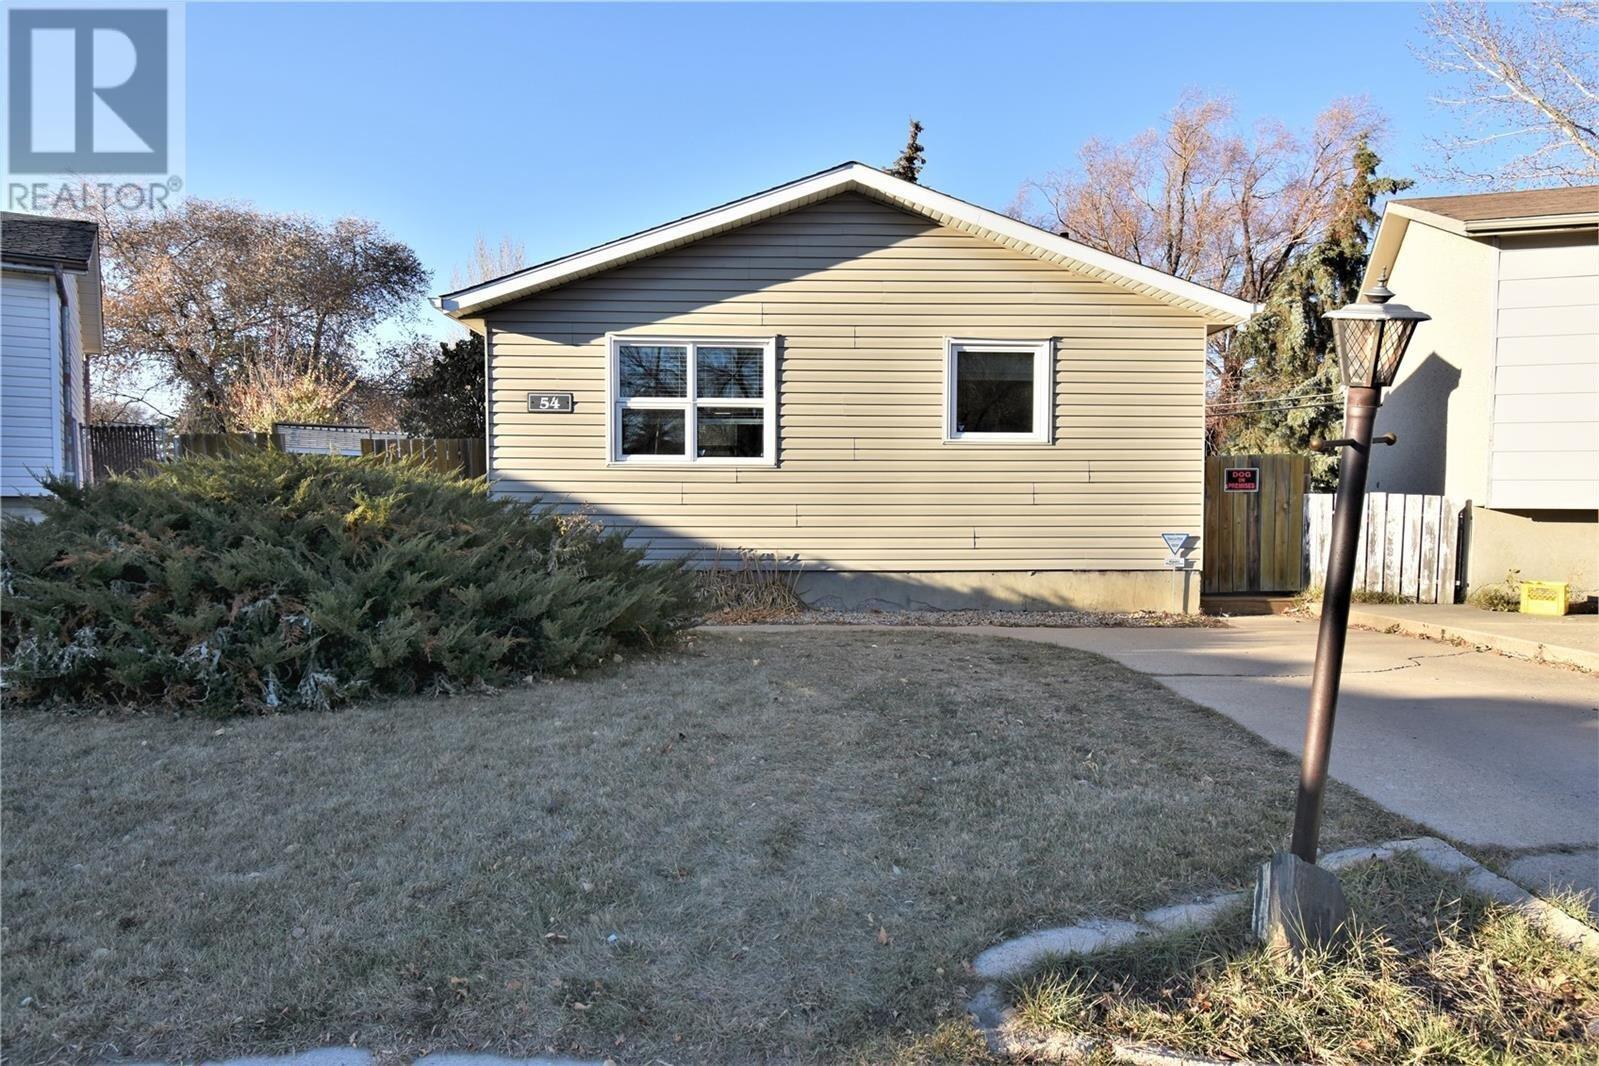 House for sale at 54 Ramsay Ct Saskatoon Saskatchewan - MLS: SK831447